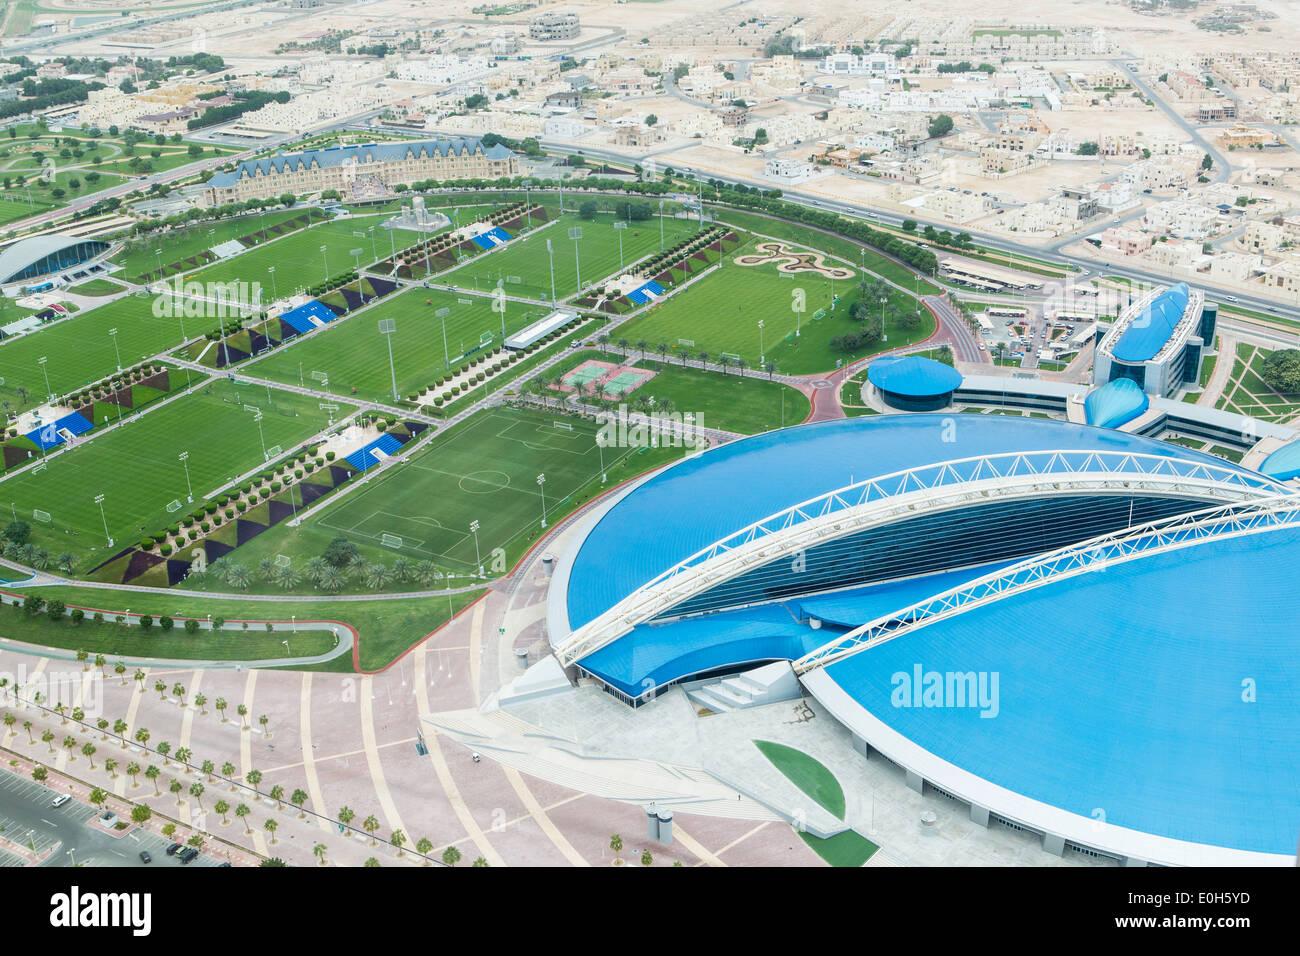 Qatar, Doha, Aspire Sports Center Imagen De Stock